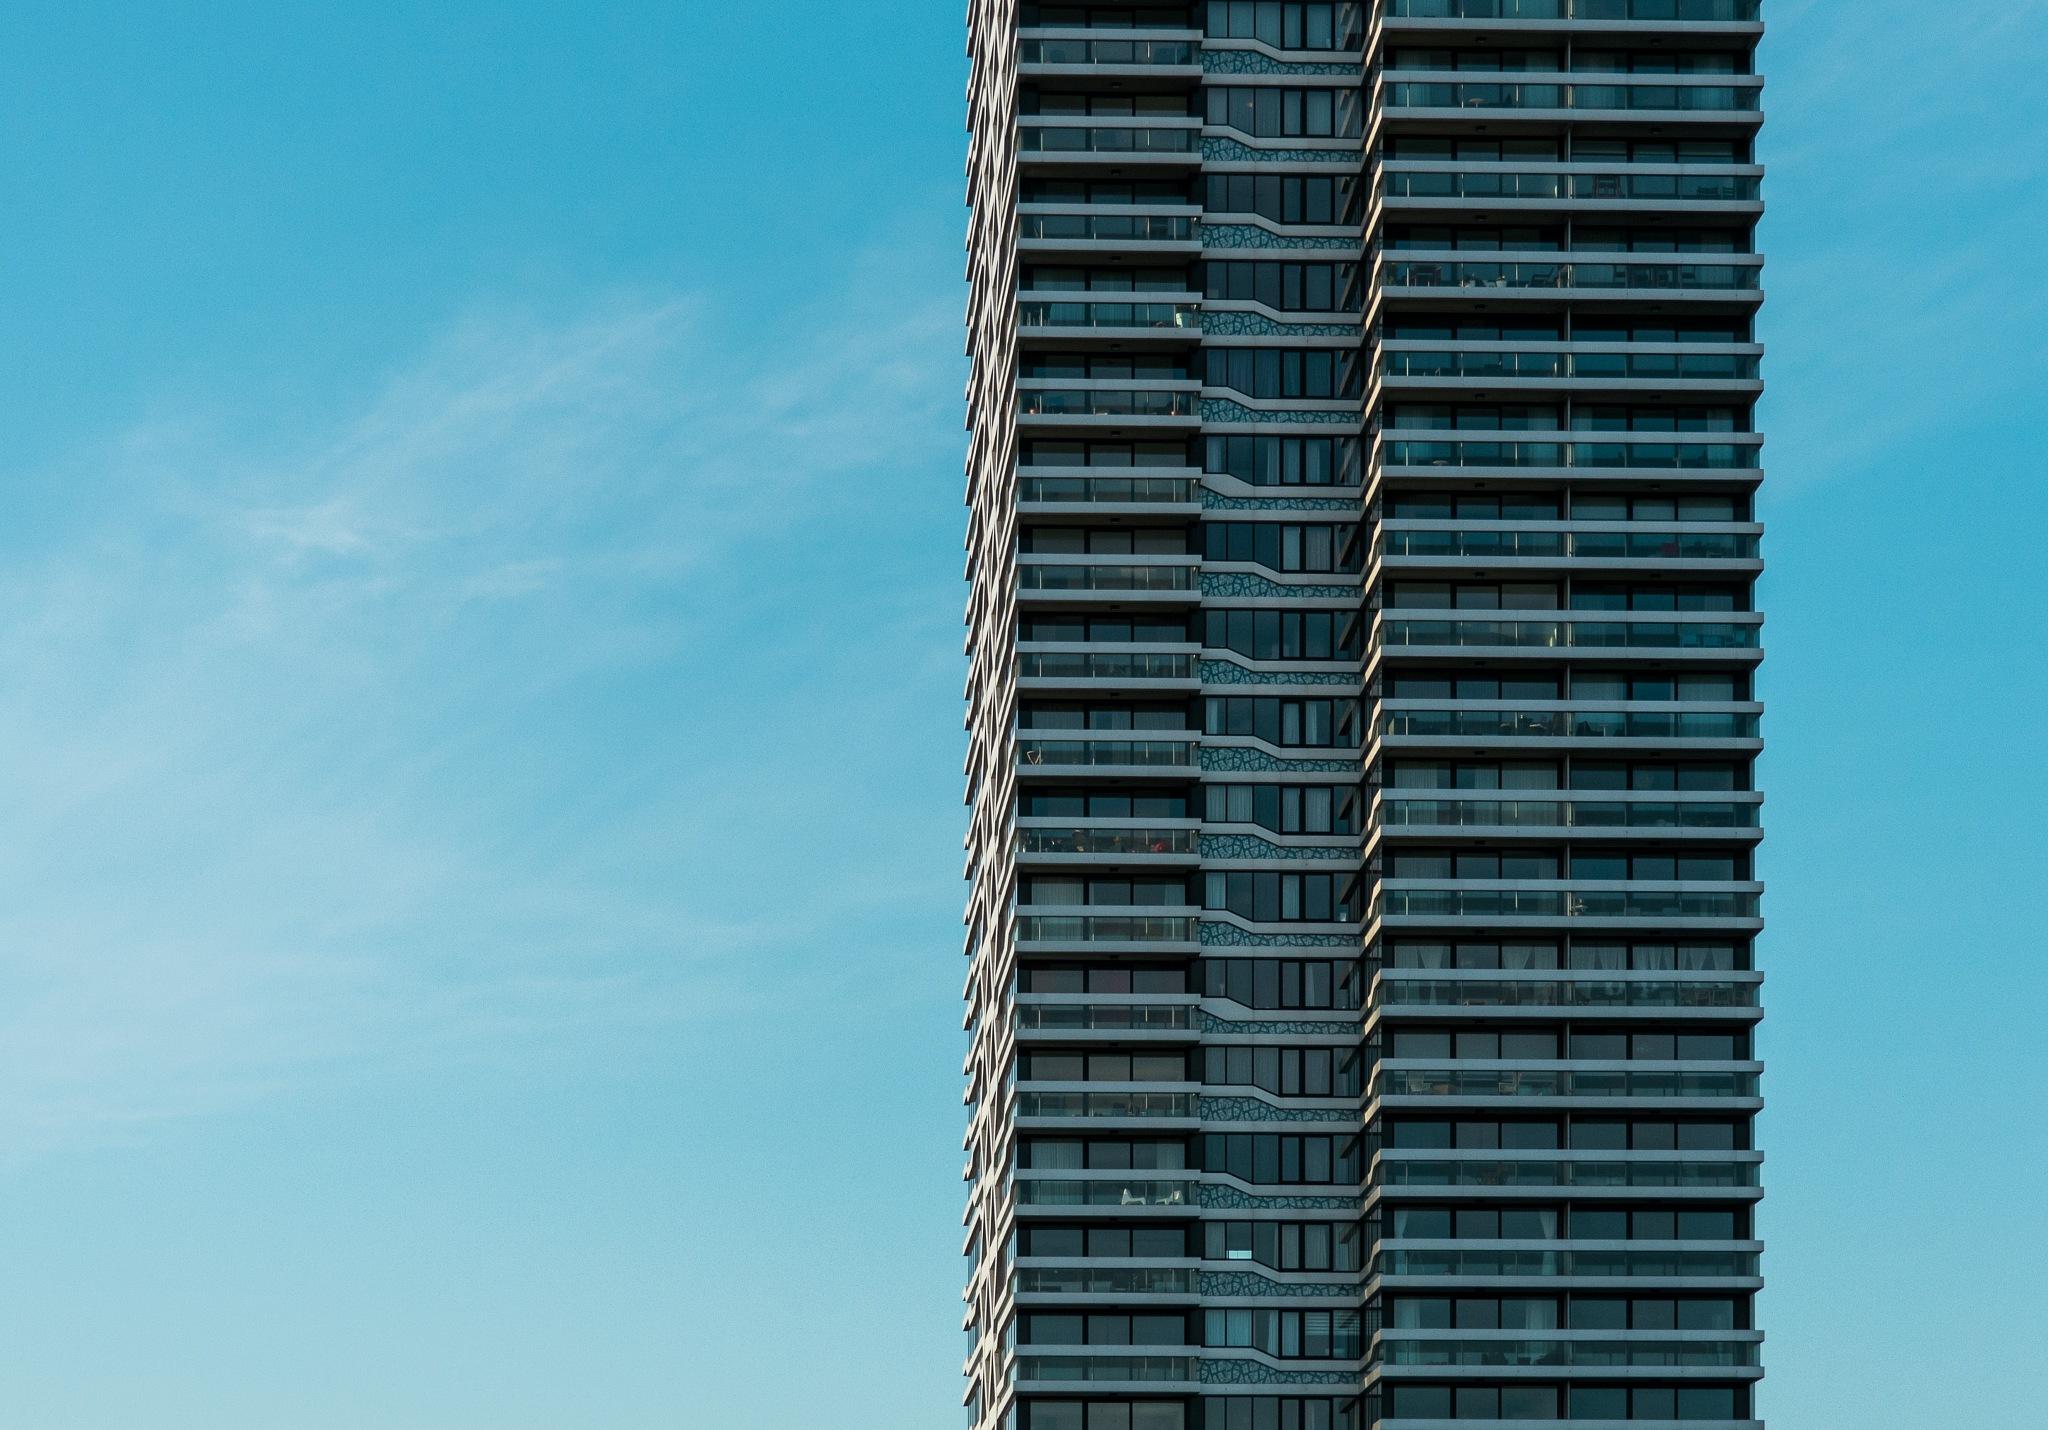 New Babylon tower by DavidZisky